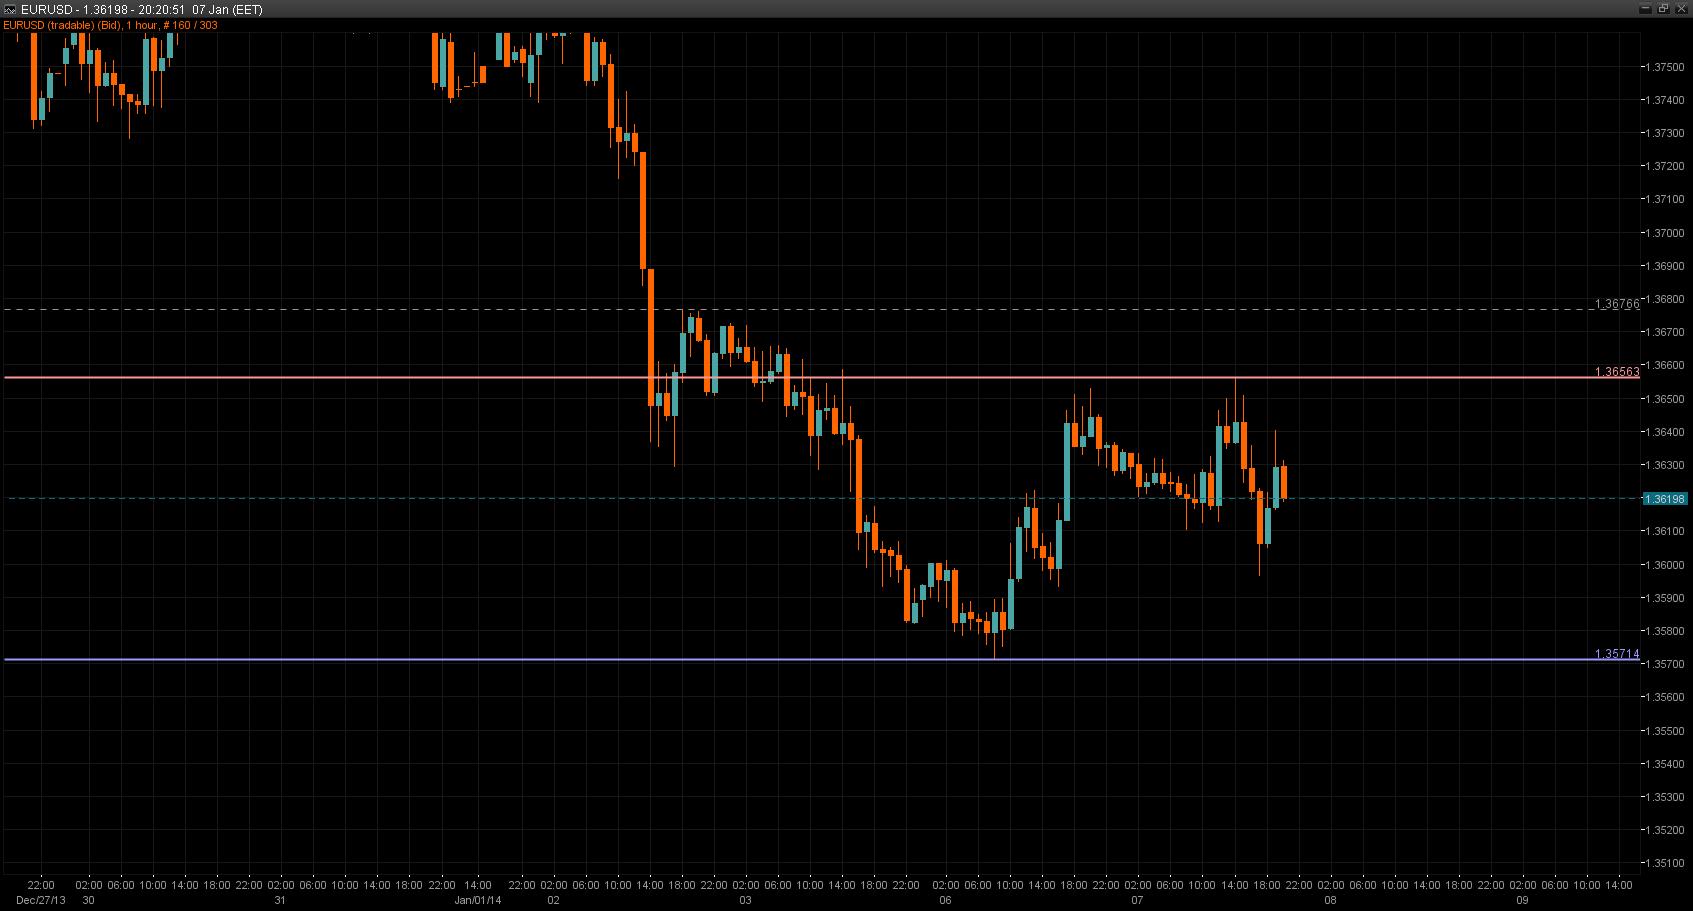 EUR/USD Chart 07 Jan 2014